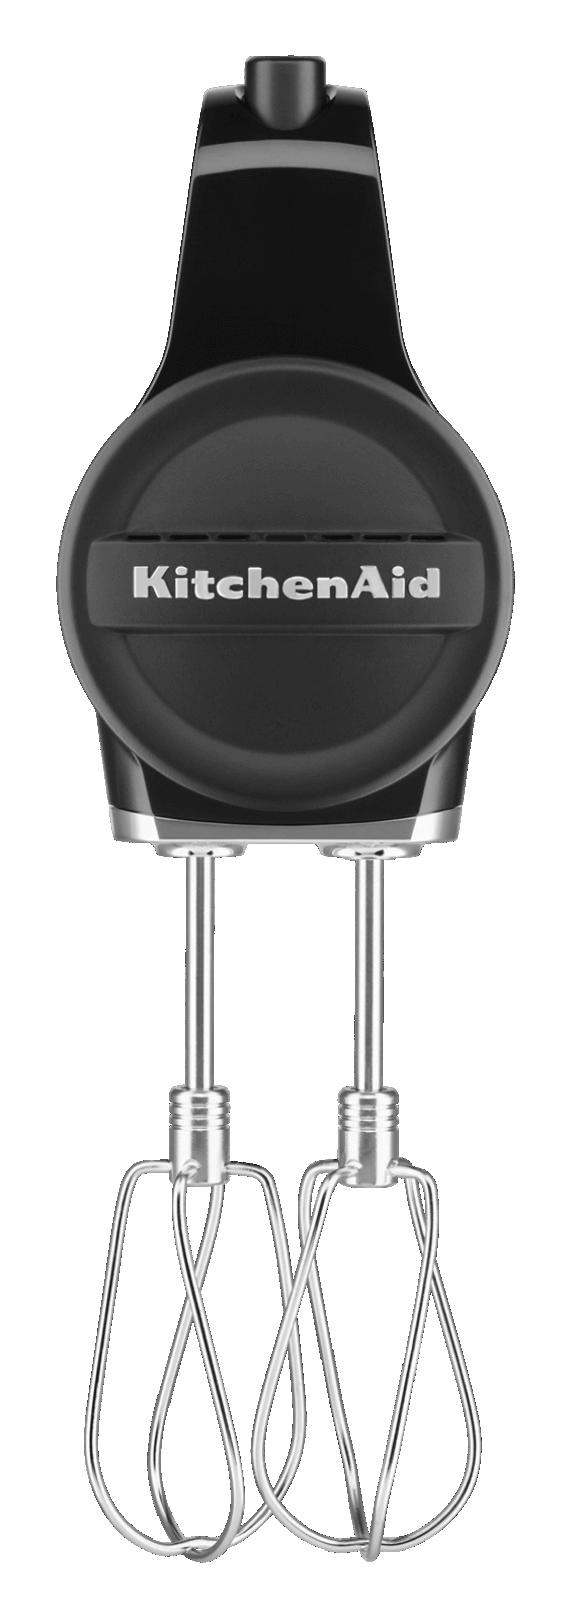 KitchenAid Black Matte Cordless Hand Mixer.